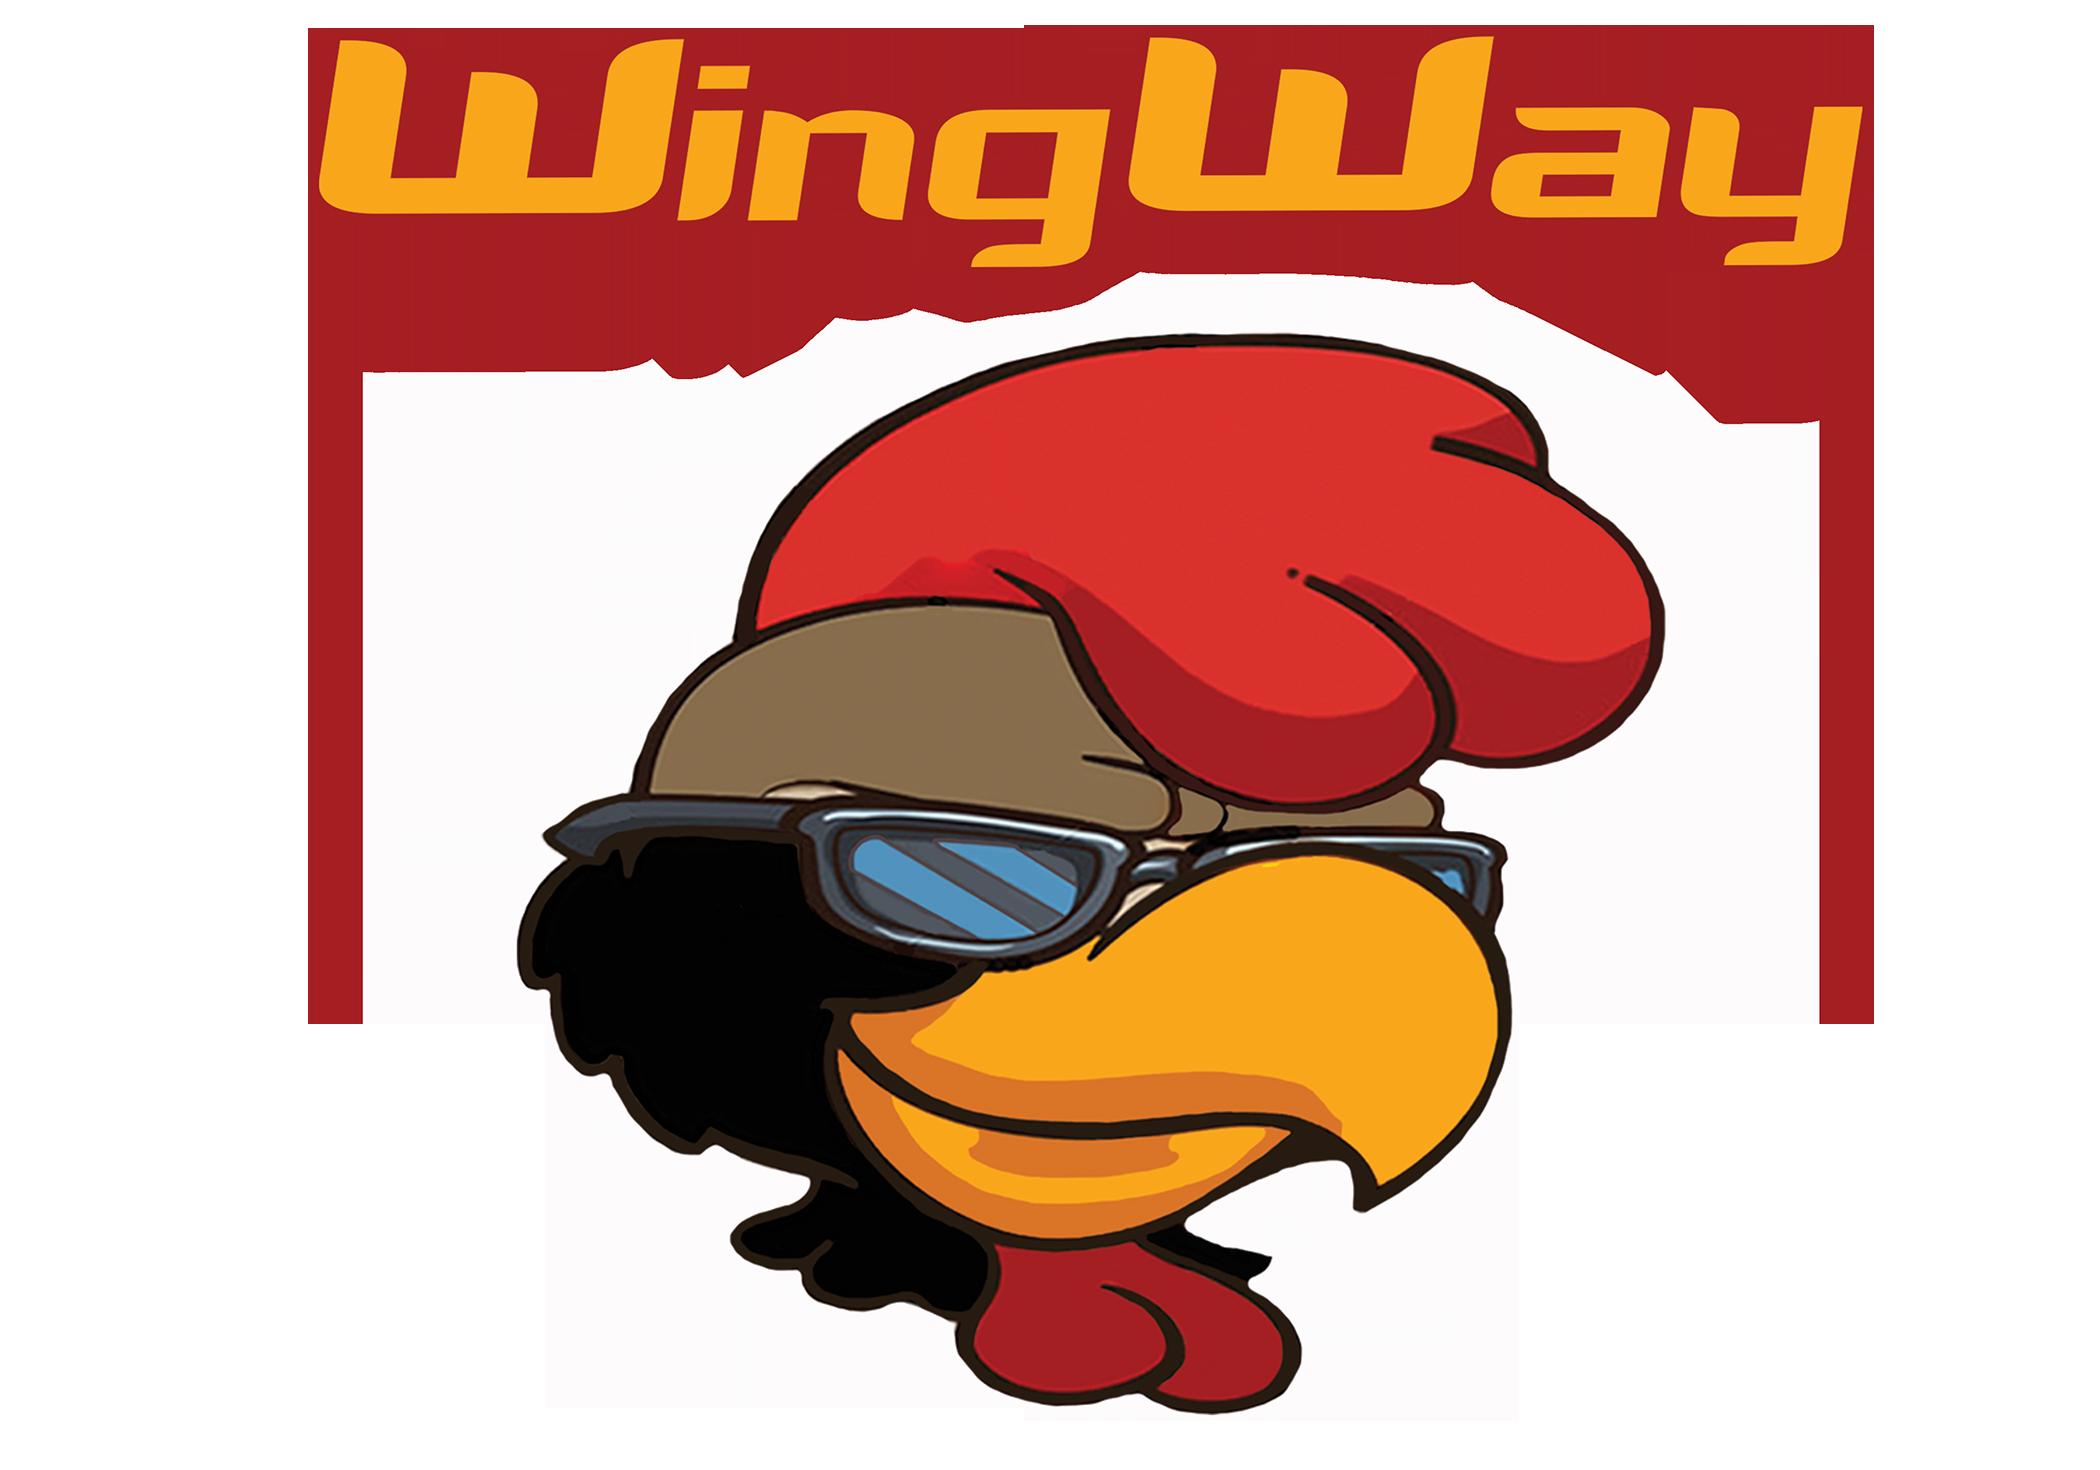 WingWay